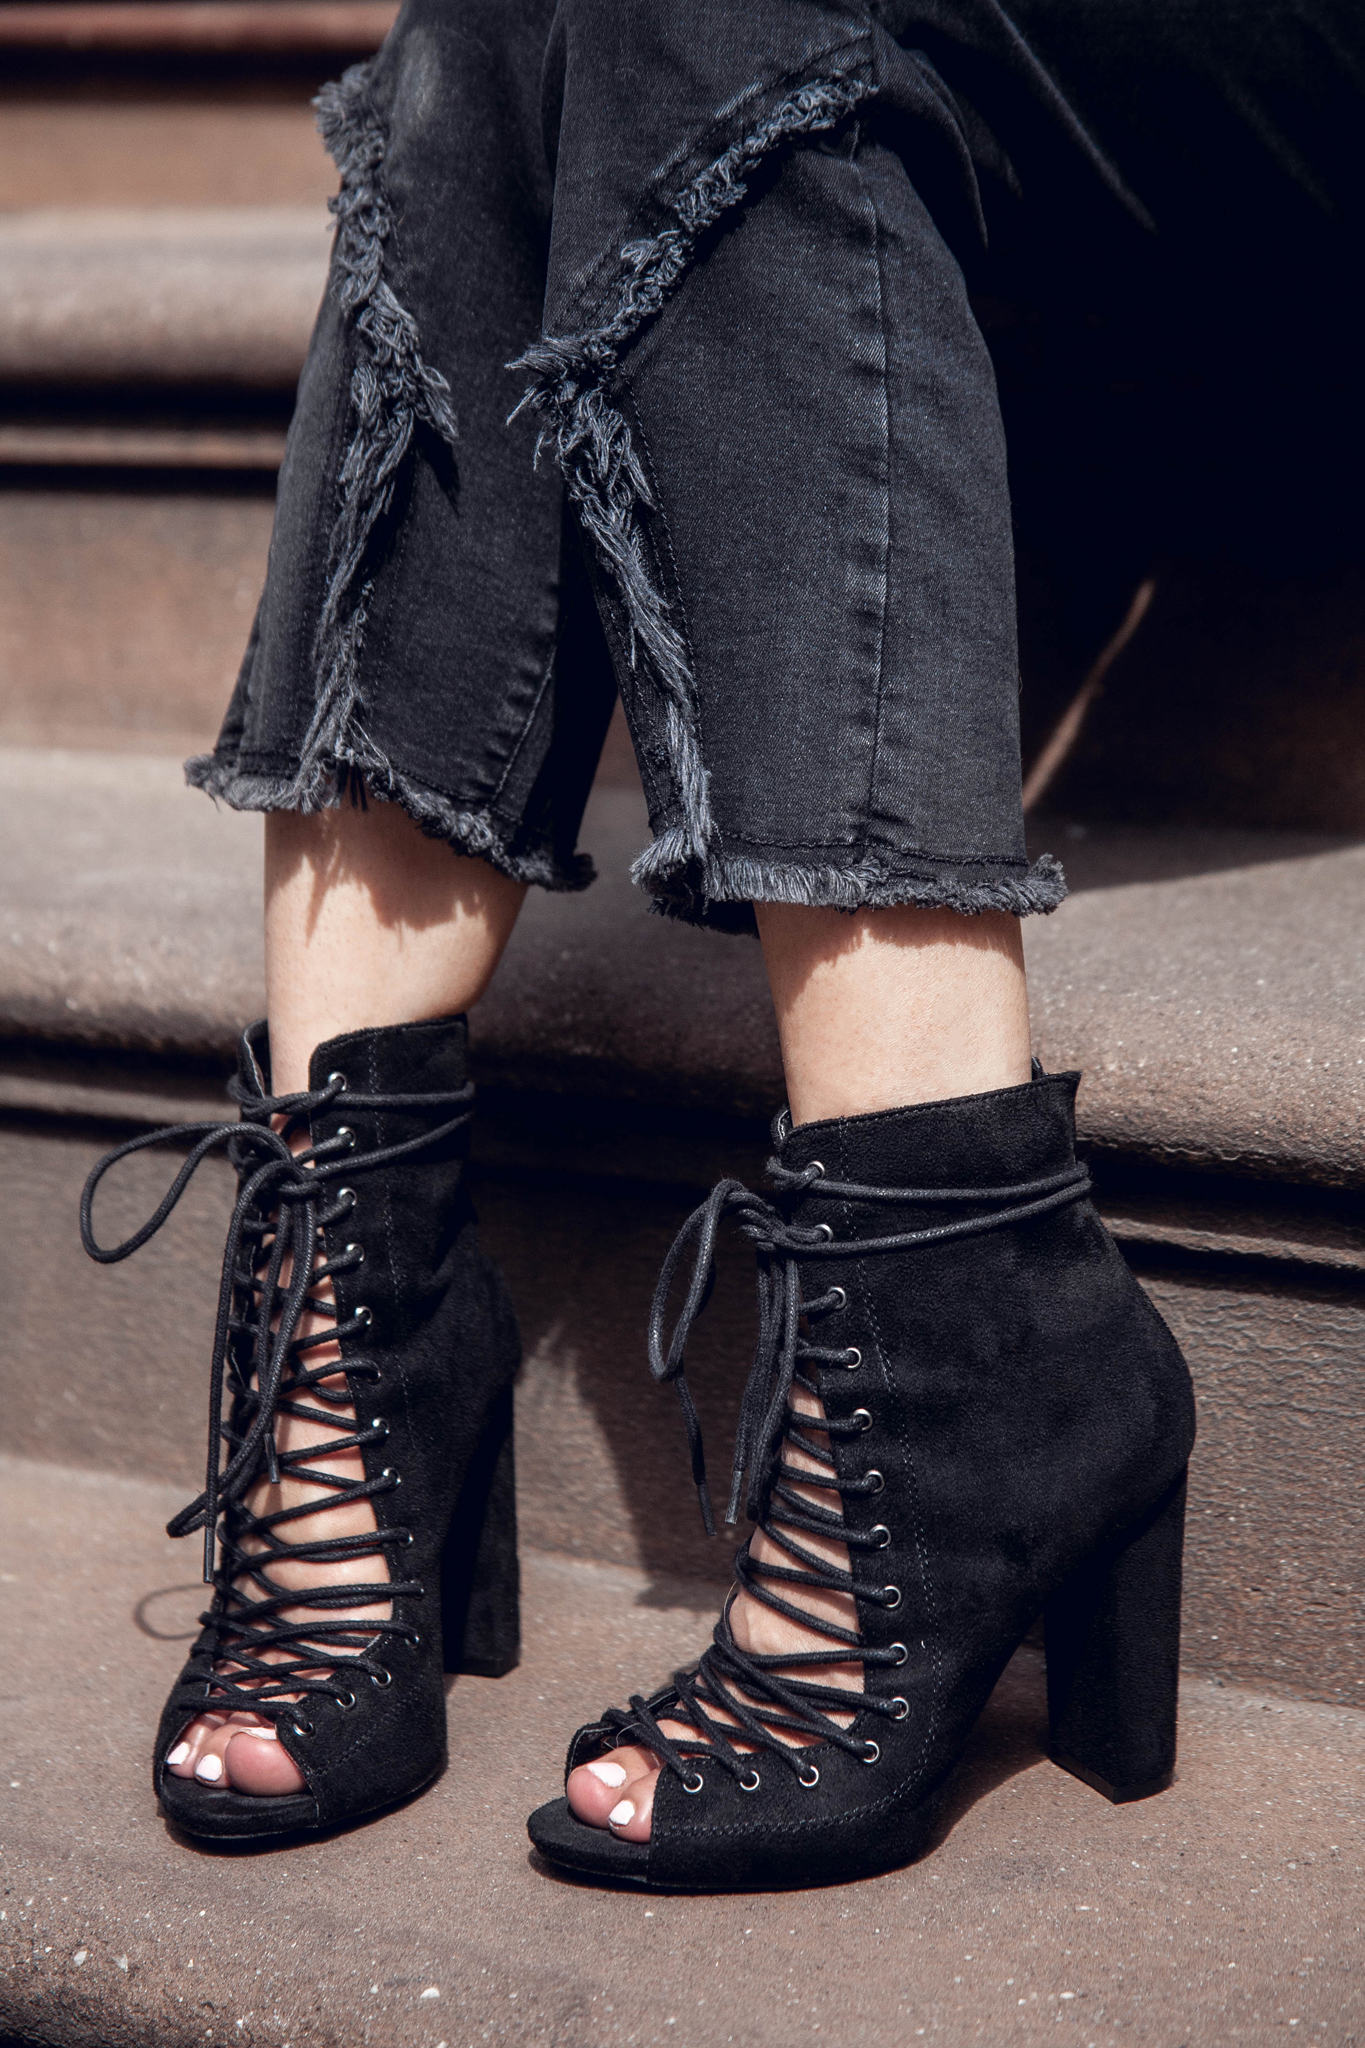 J. Adams Heels